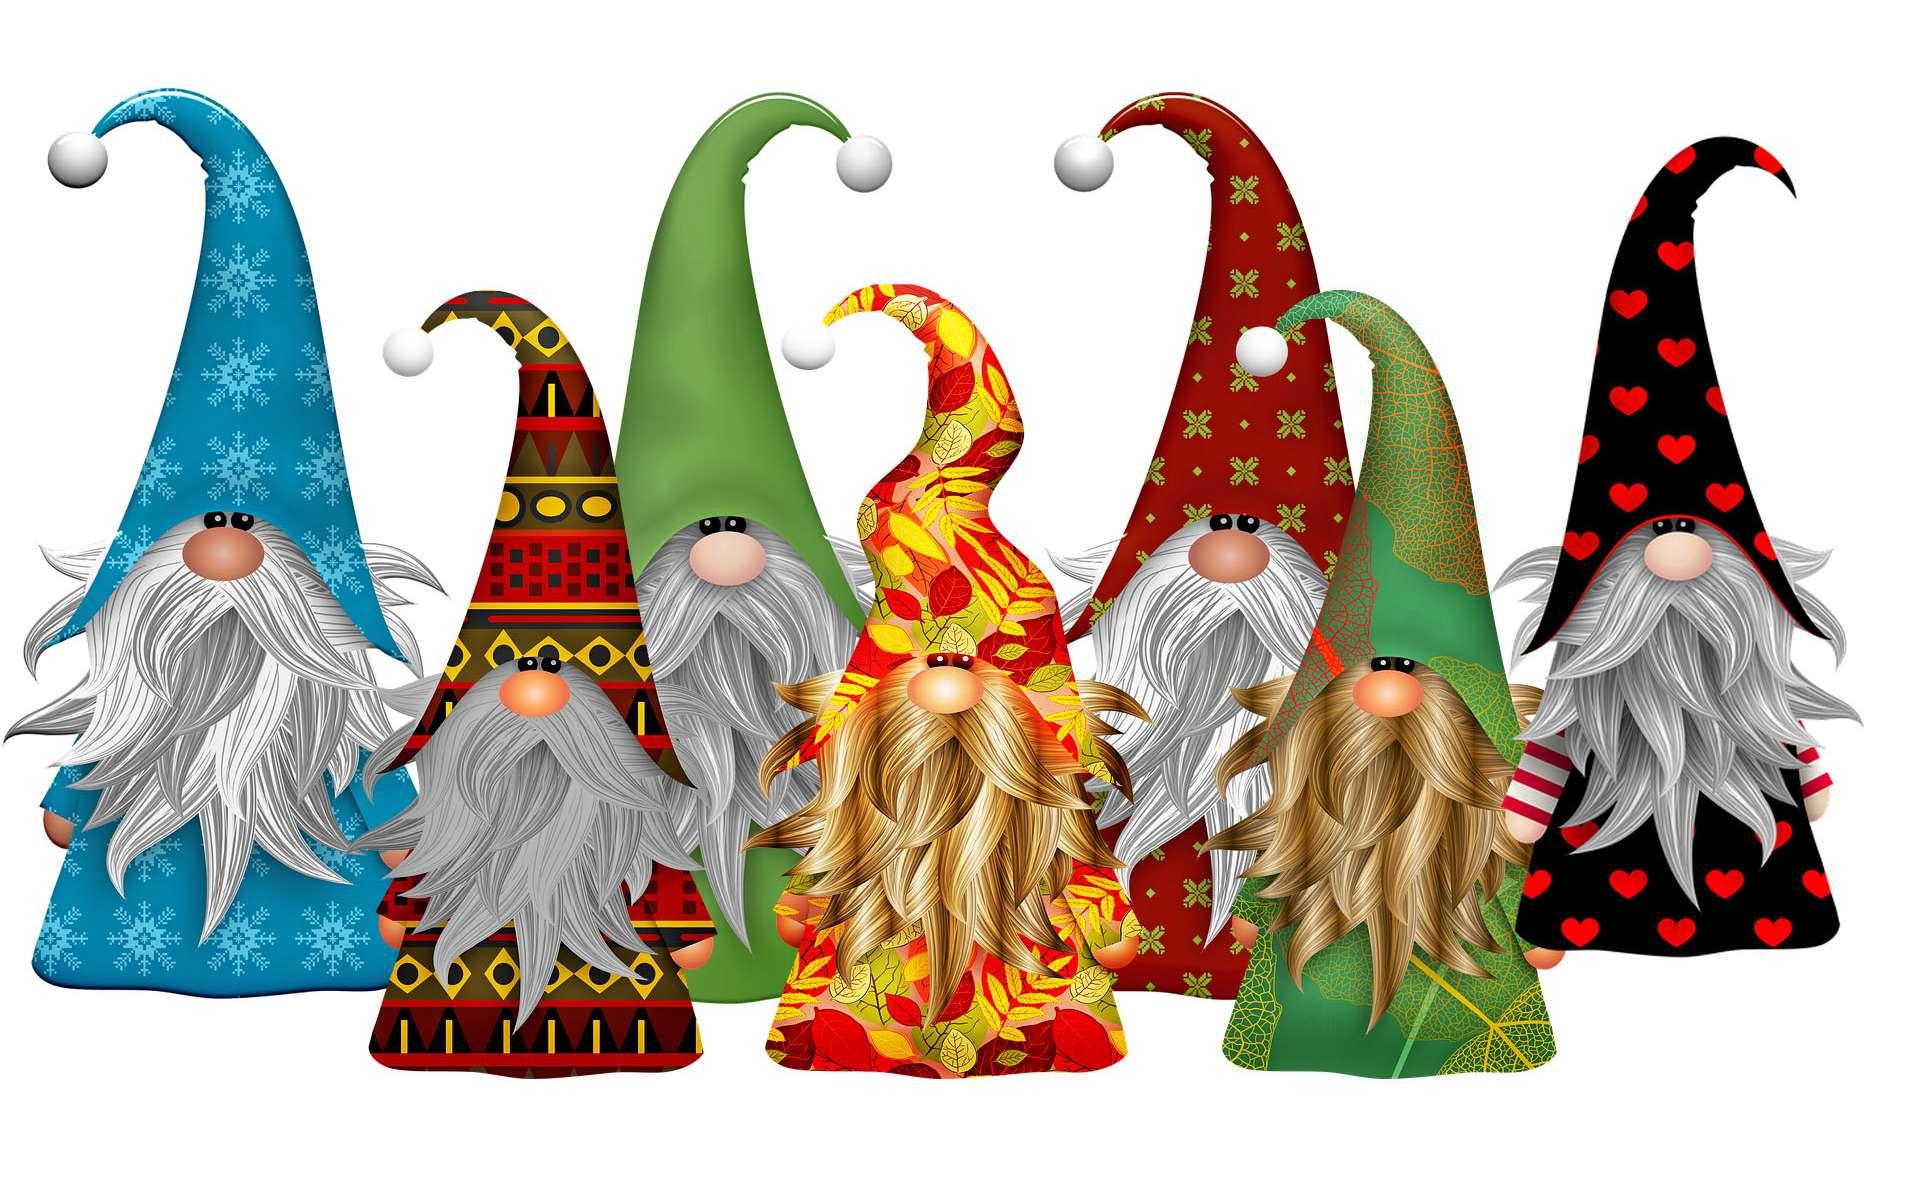 Jeu mathématique des 7 nains © AnalyseArt, Pixabay, DP